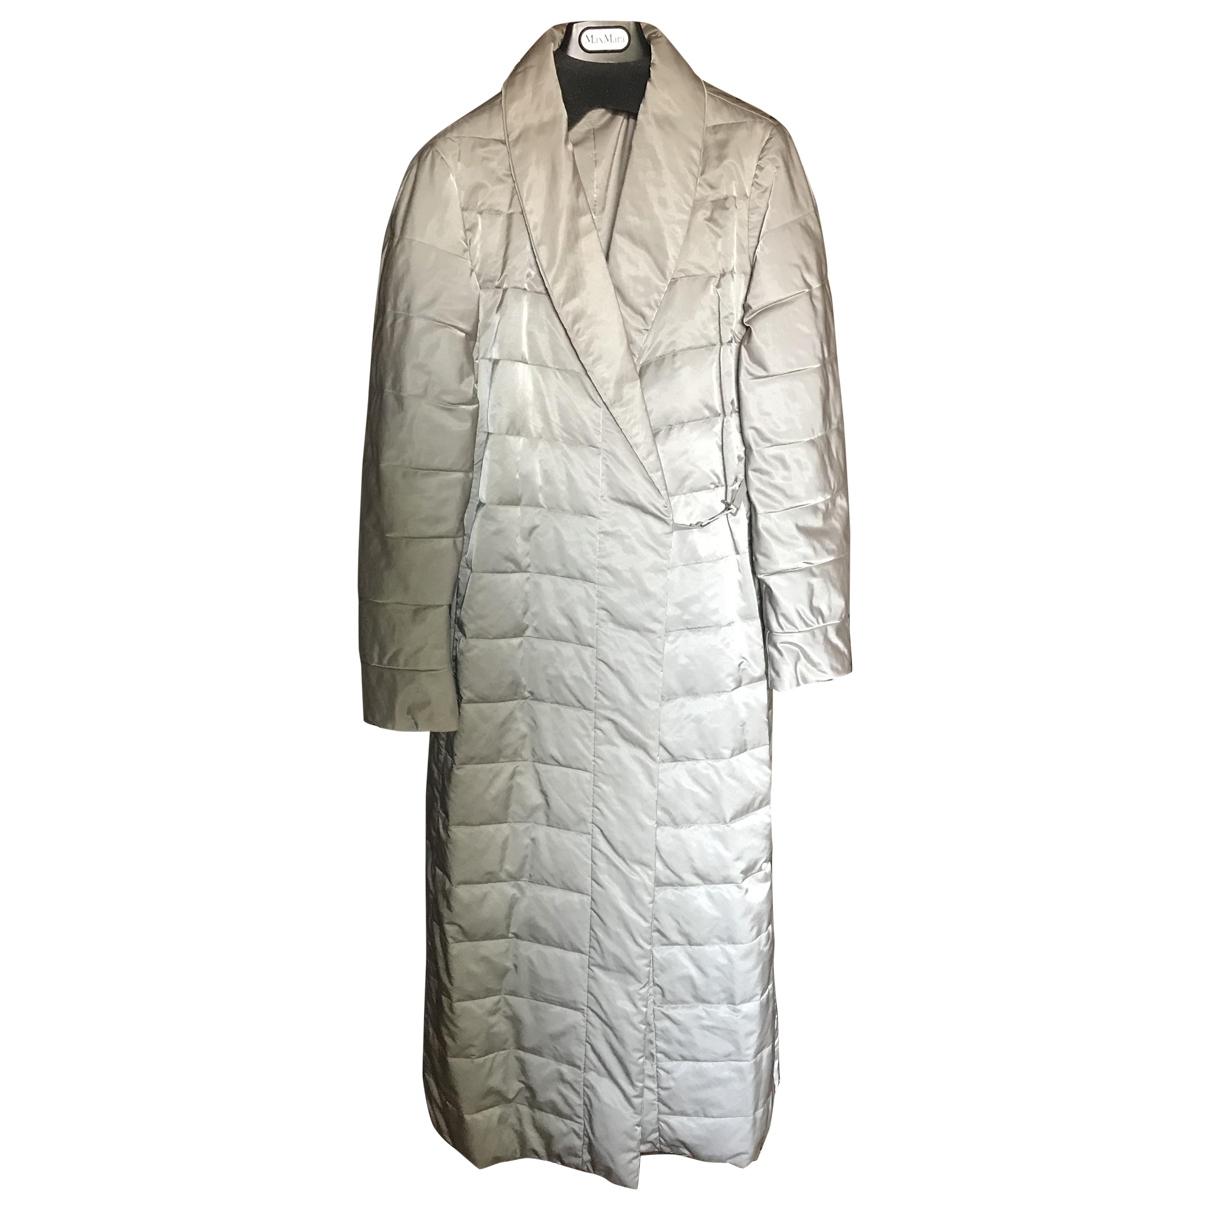 Max Mara 's \N Beige coat for Women 42 IT